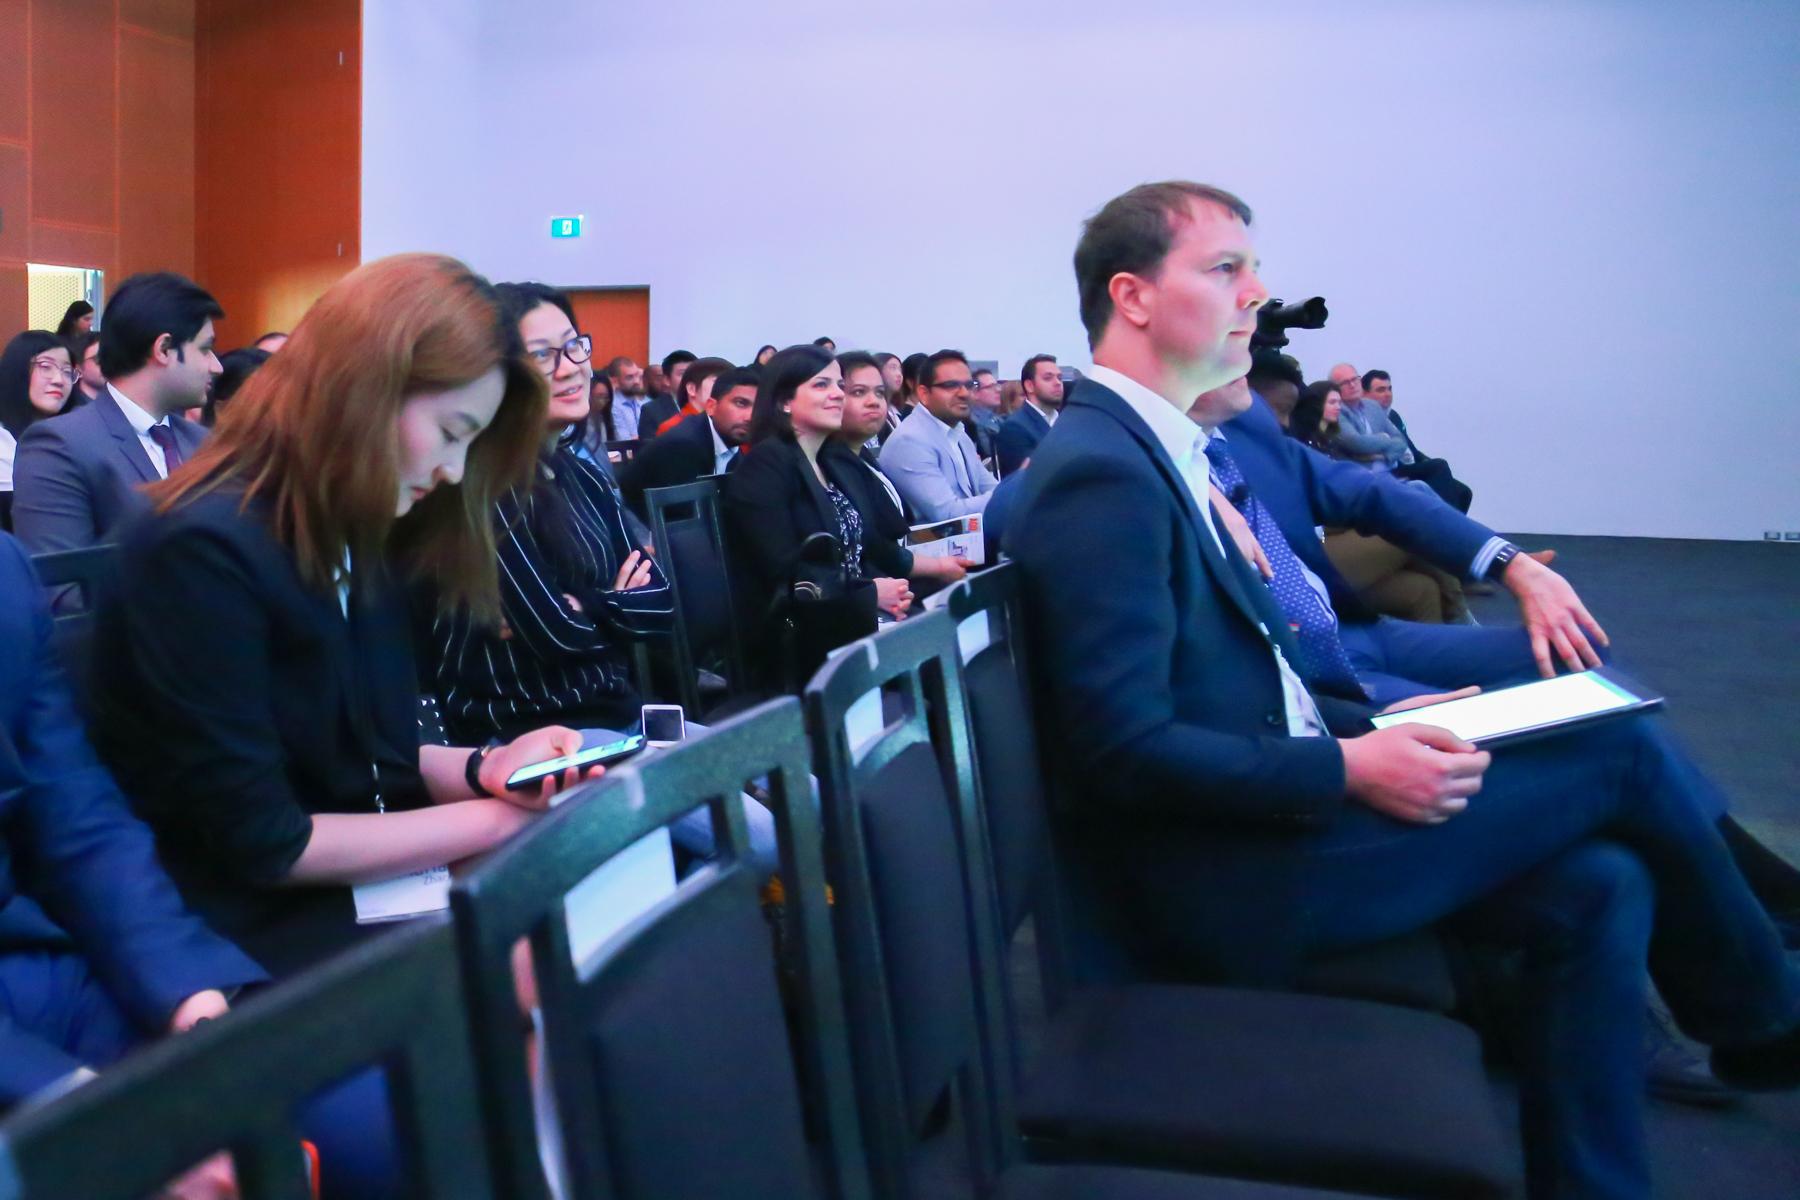 ABD_Conference_2018-082.jpg